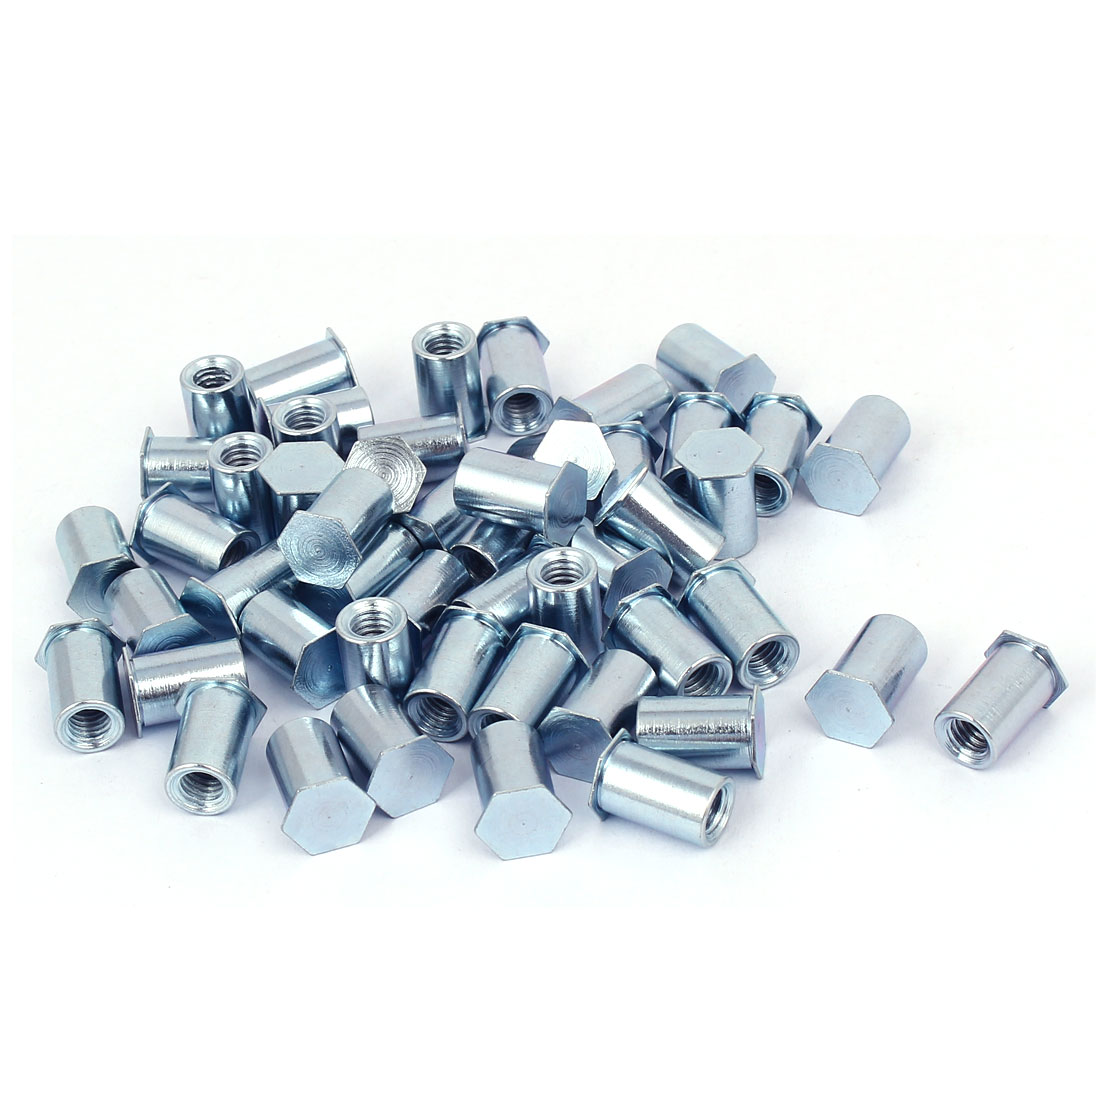 Unique Bargains M6 x 14mm Thread Blind Hole Carbon Steel Self Clinching Standoffs 50 Pcs